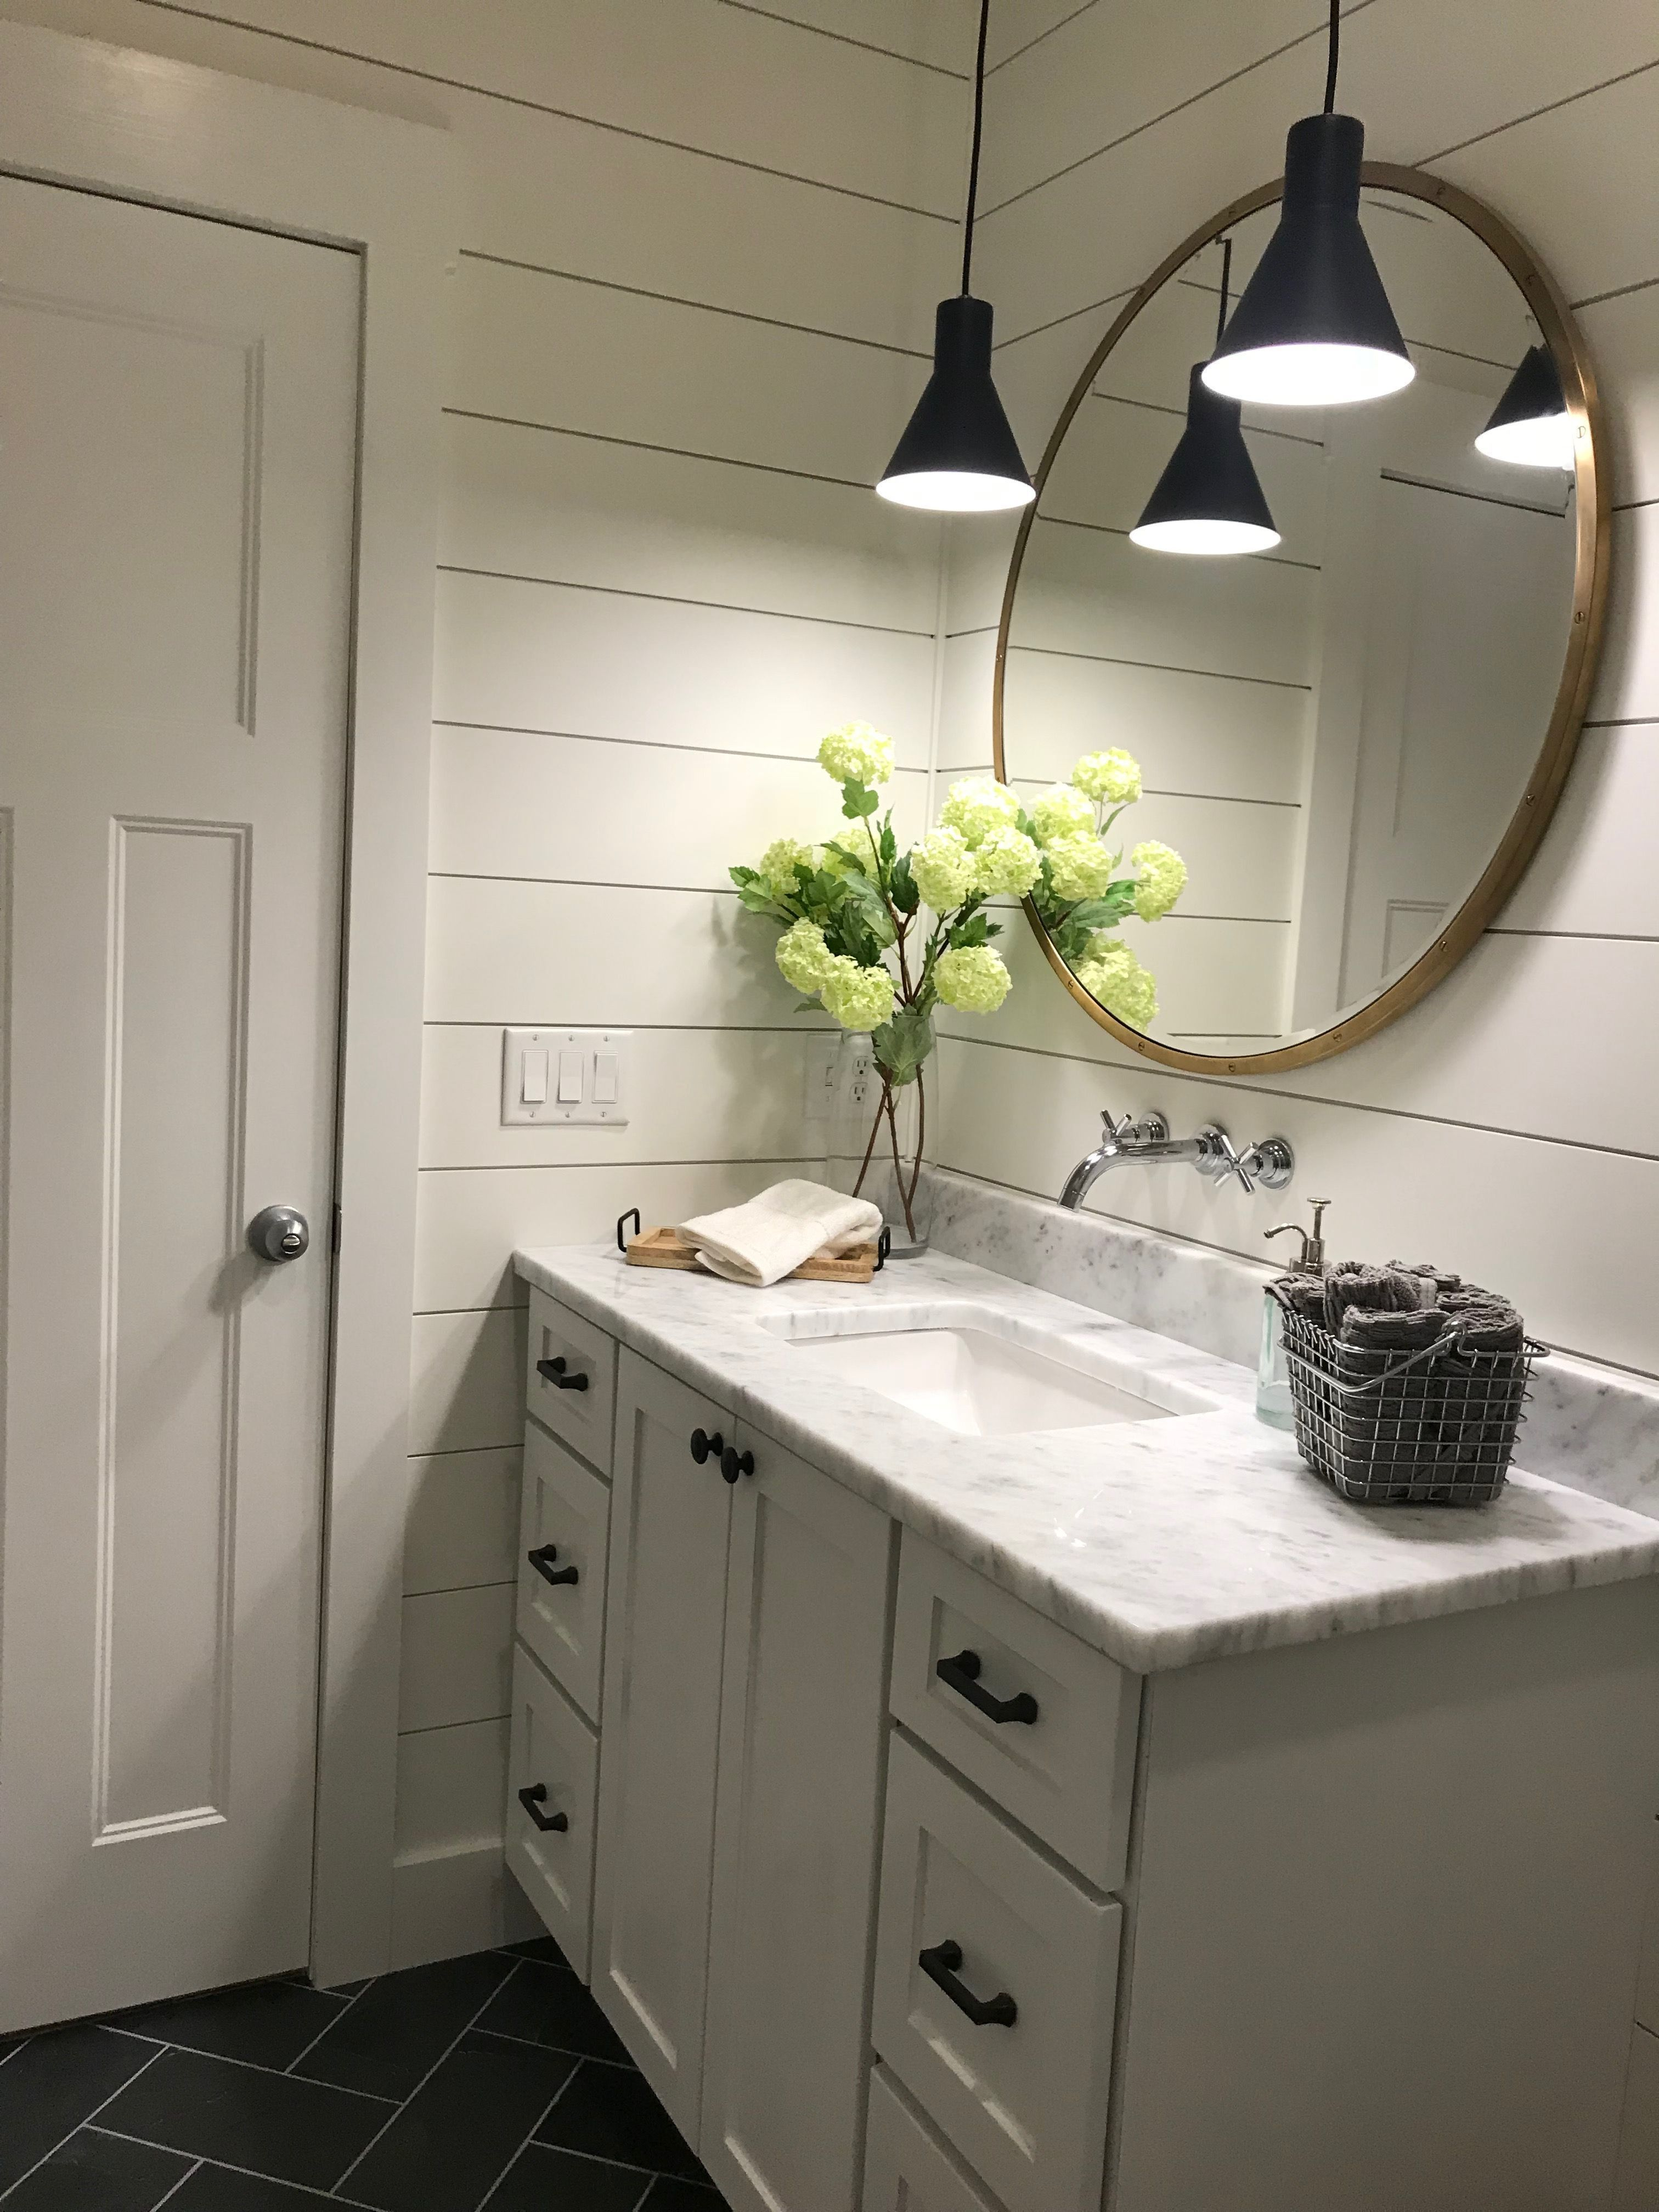 Shiplap Modern Farmhouse Round Mirror Brass Cottage Bathroom Design Ideas Modern Farmhouse Bathroom Bathroom Decor [ 4032 x 3024 Pixel ]